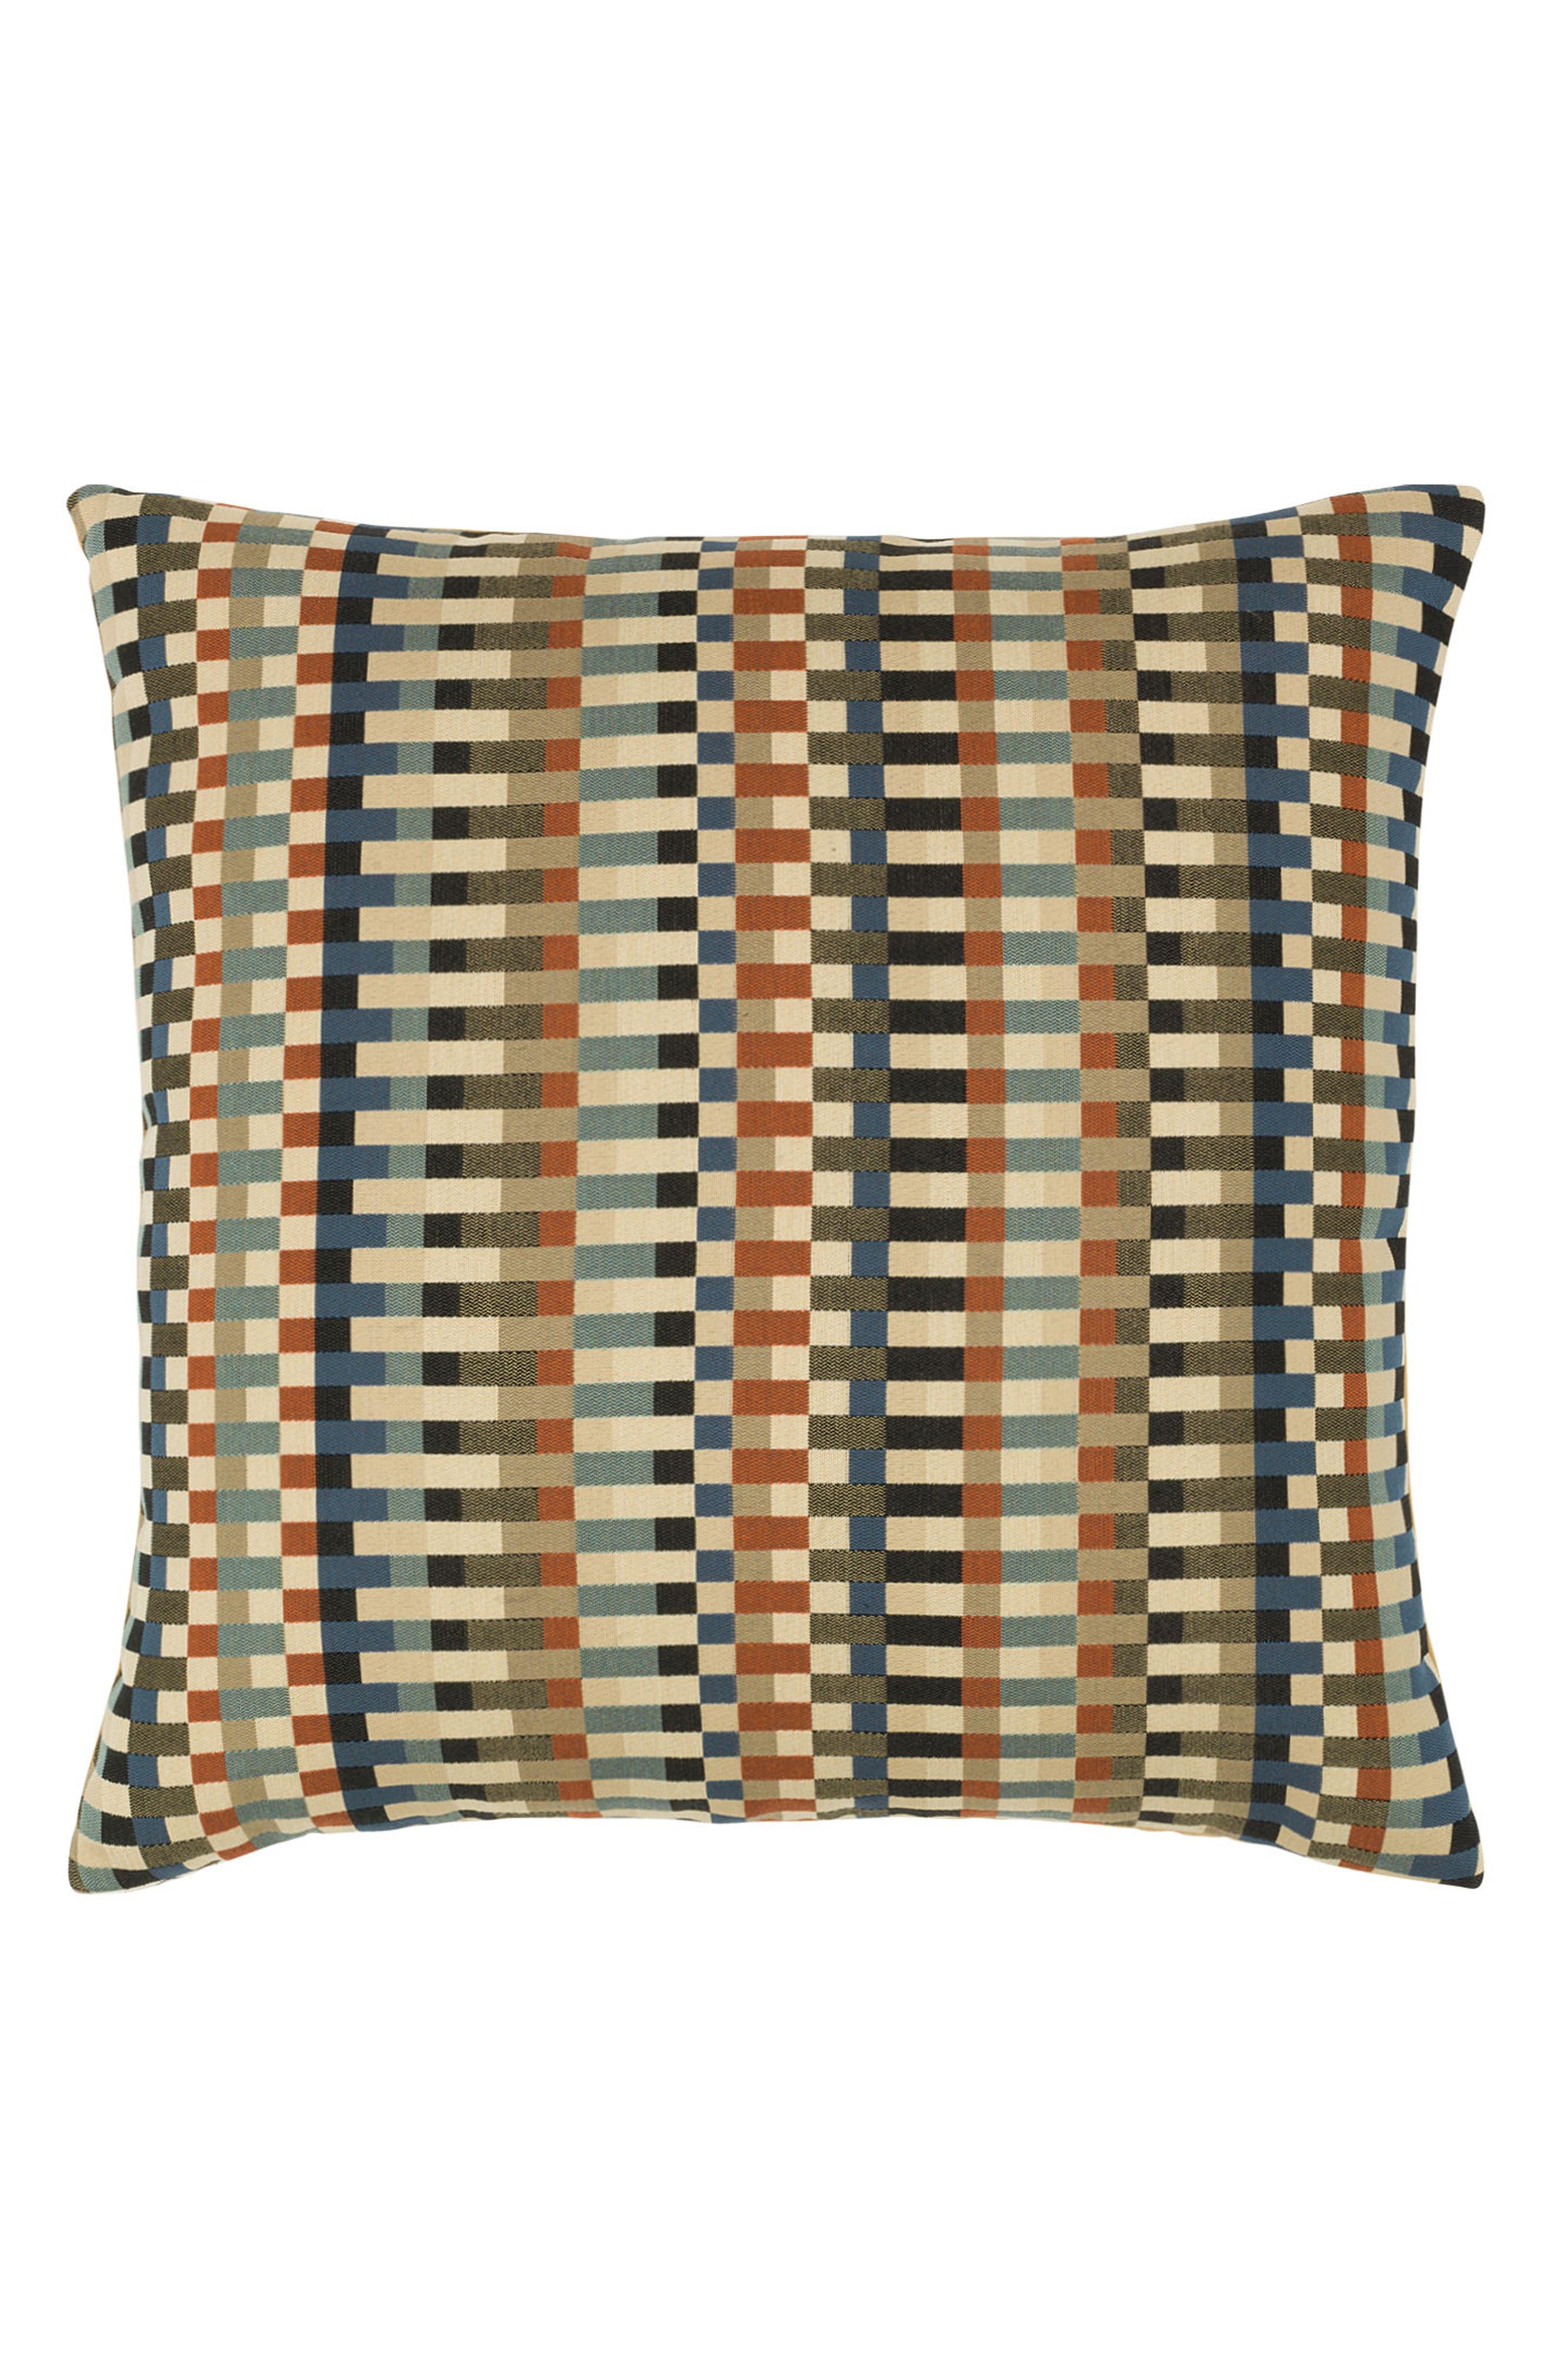 Elaine Smith Copper Mountain Indoor/Outdoor Accent Pillow